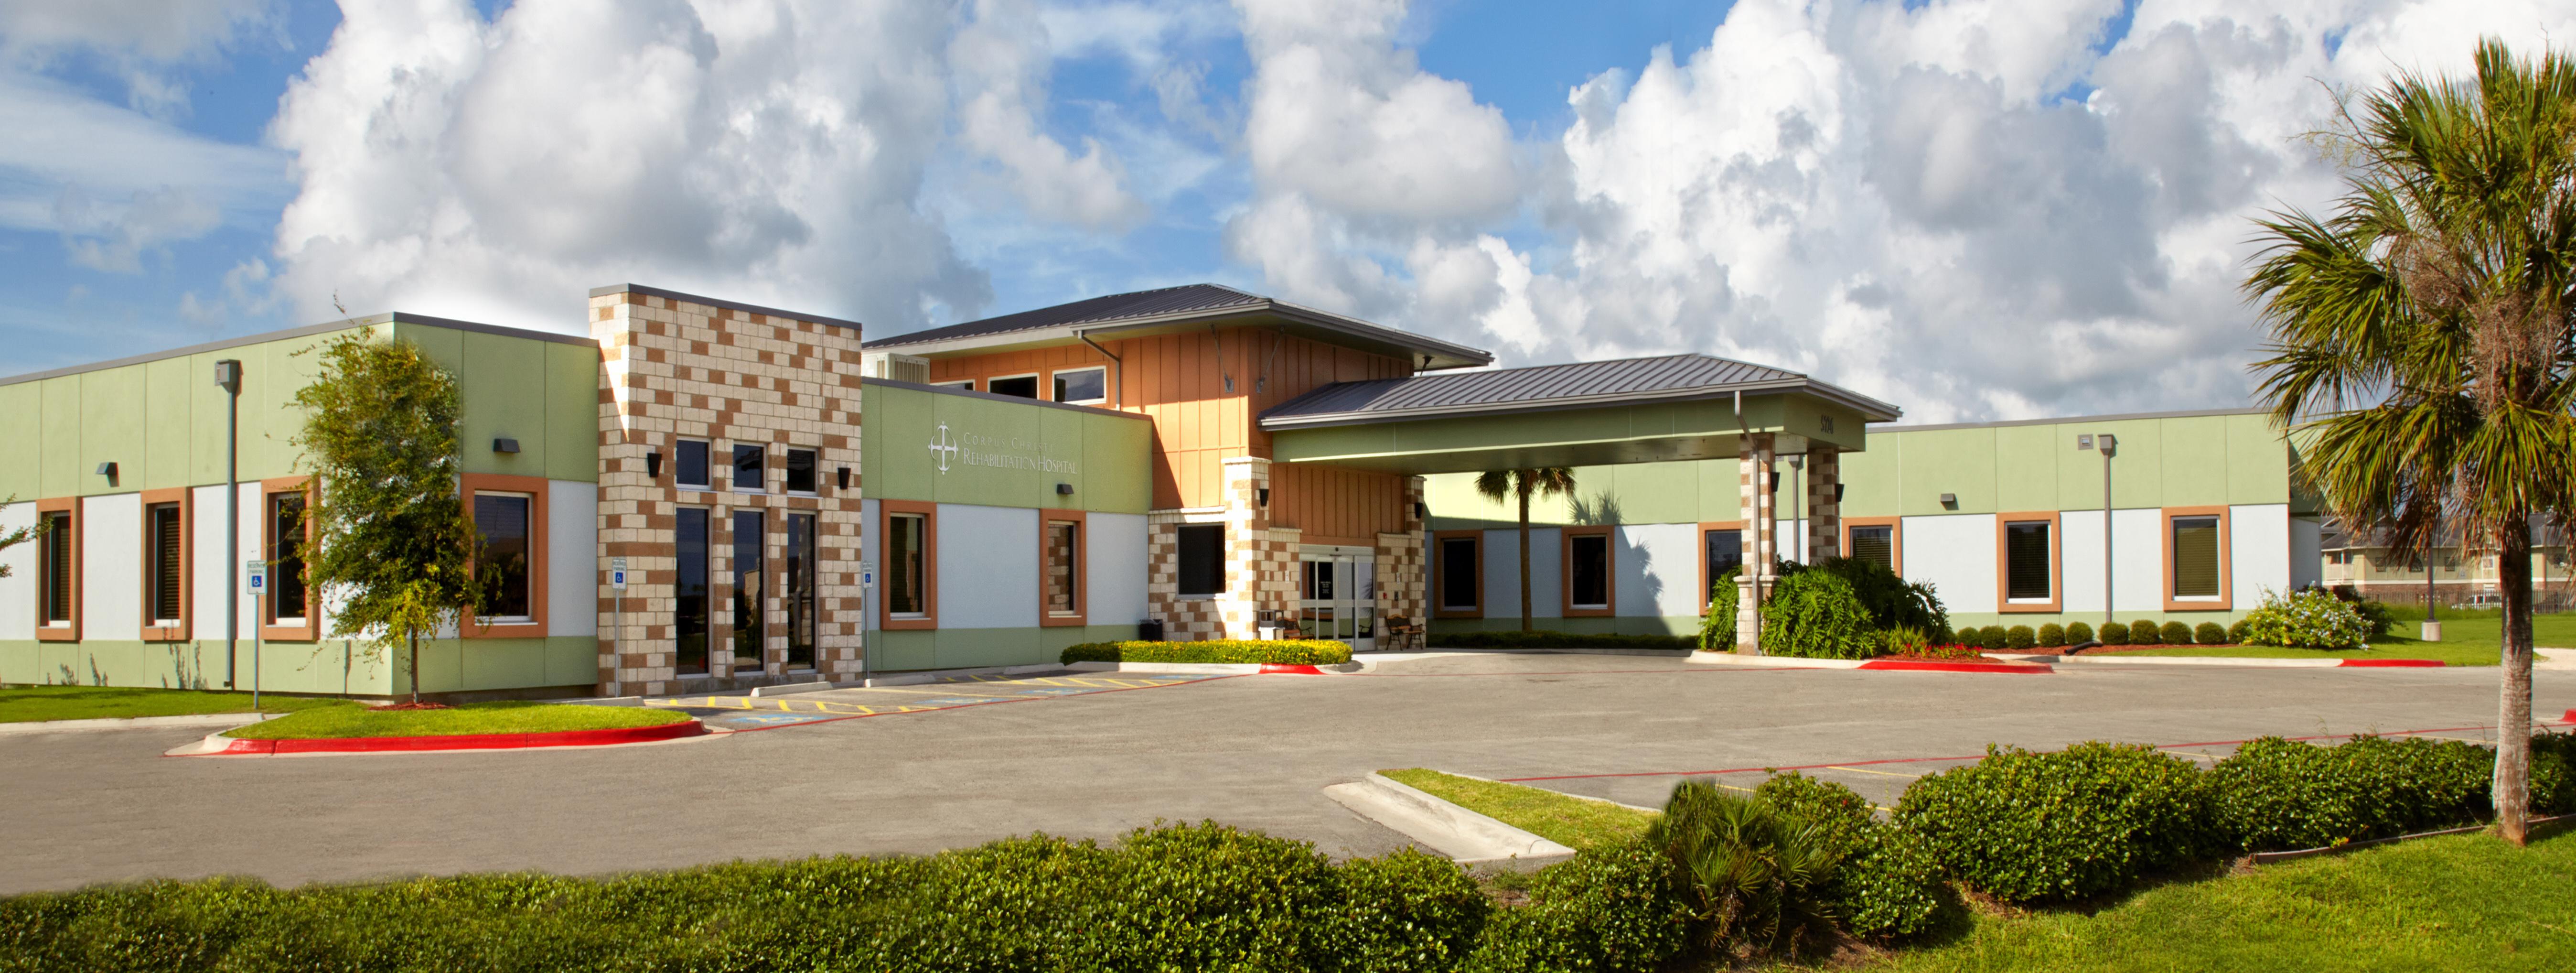 Corpus Christi Rehabilitation Hospital reviews | Rehabilitation Center at 5726 Esplanade Drive - Corpus Christi TX